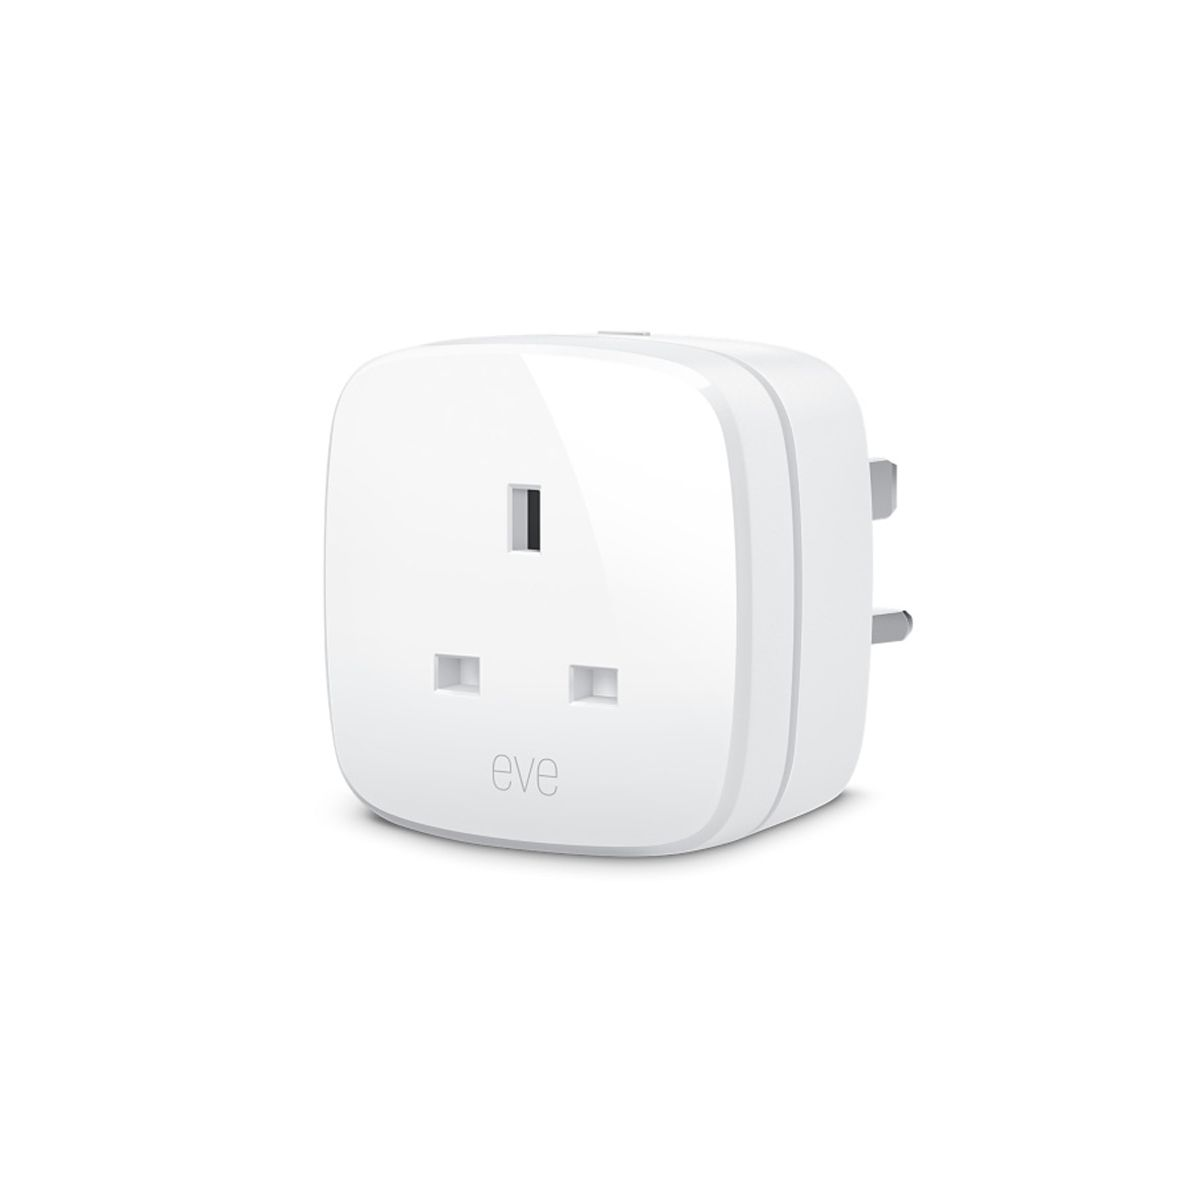 Elgato Eve Energy UK Plug Switch & Power Meter